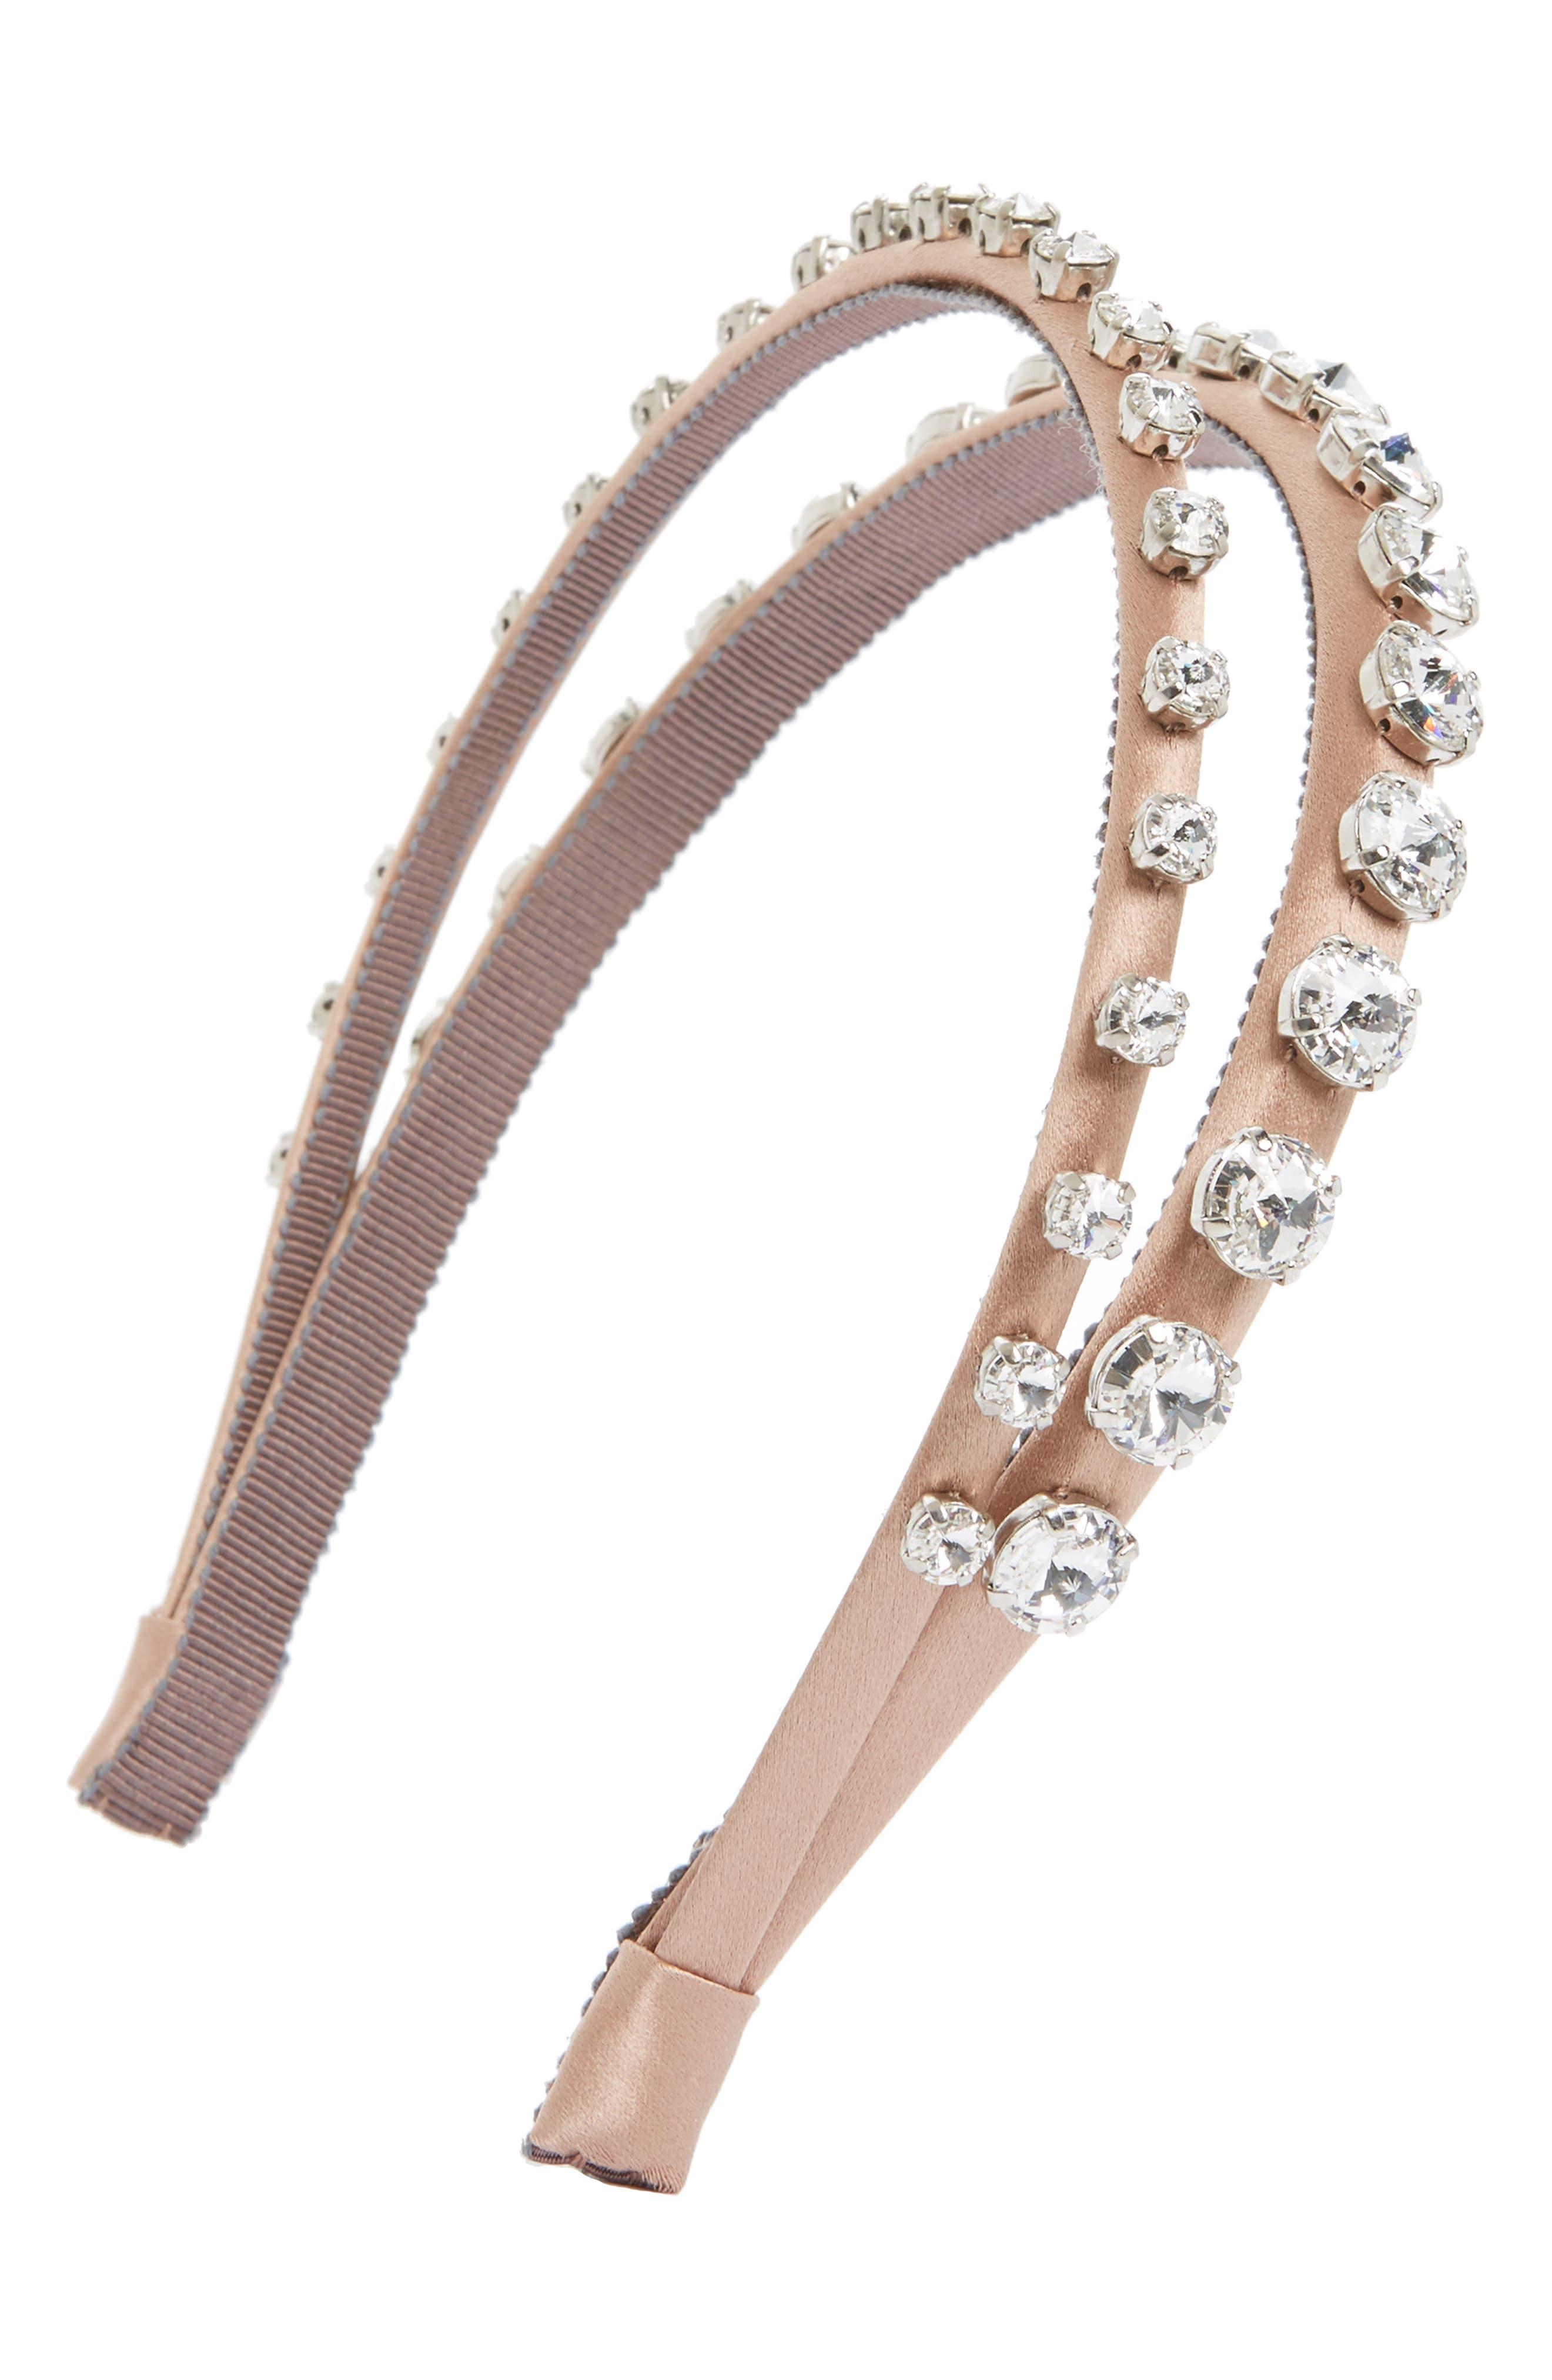 MIU MIU Raso Swarovski Crystal Double Headband